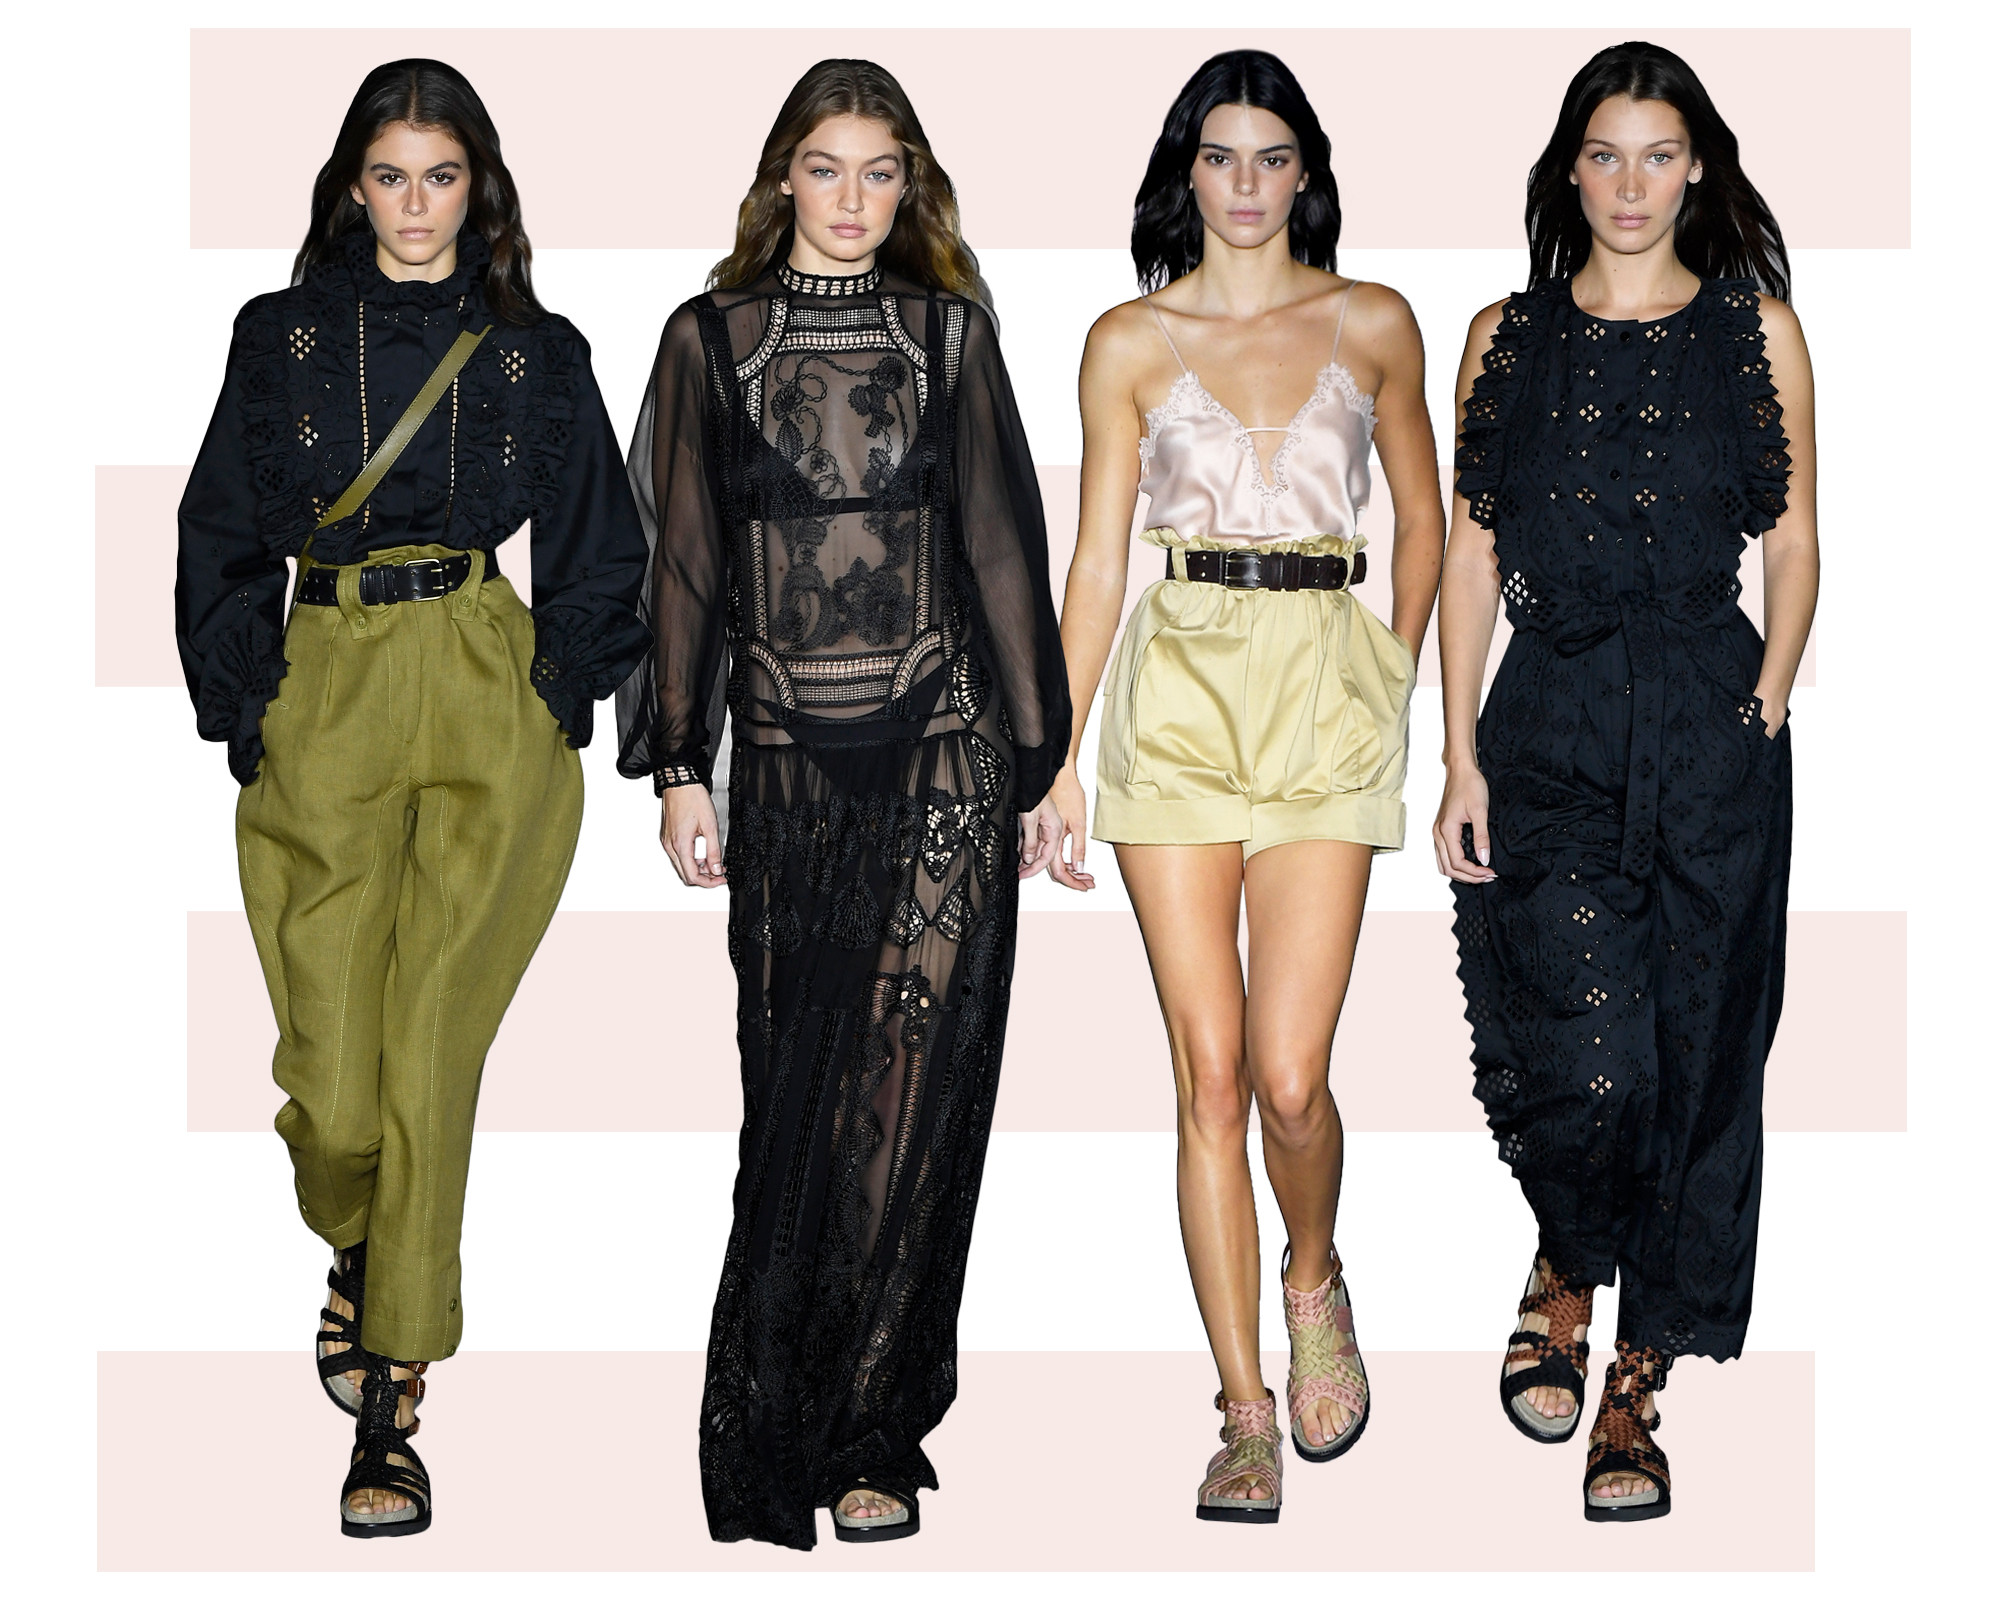 ESC: Milan Fashion Week, Alberta Ferretti, Gigi Hadid, Kendall Jenner